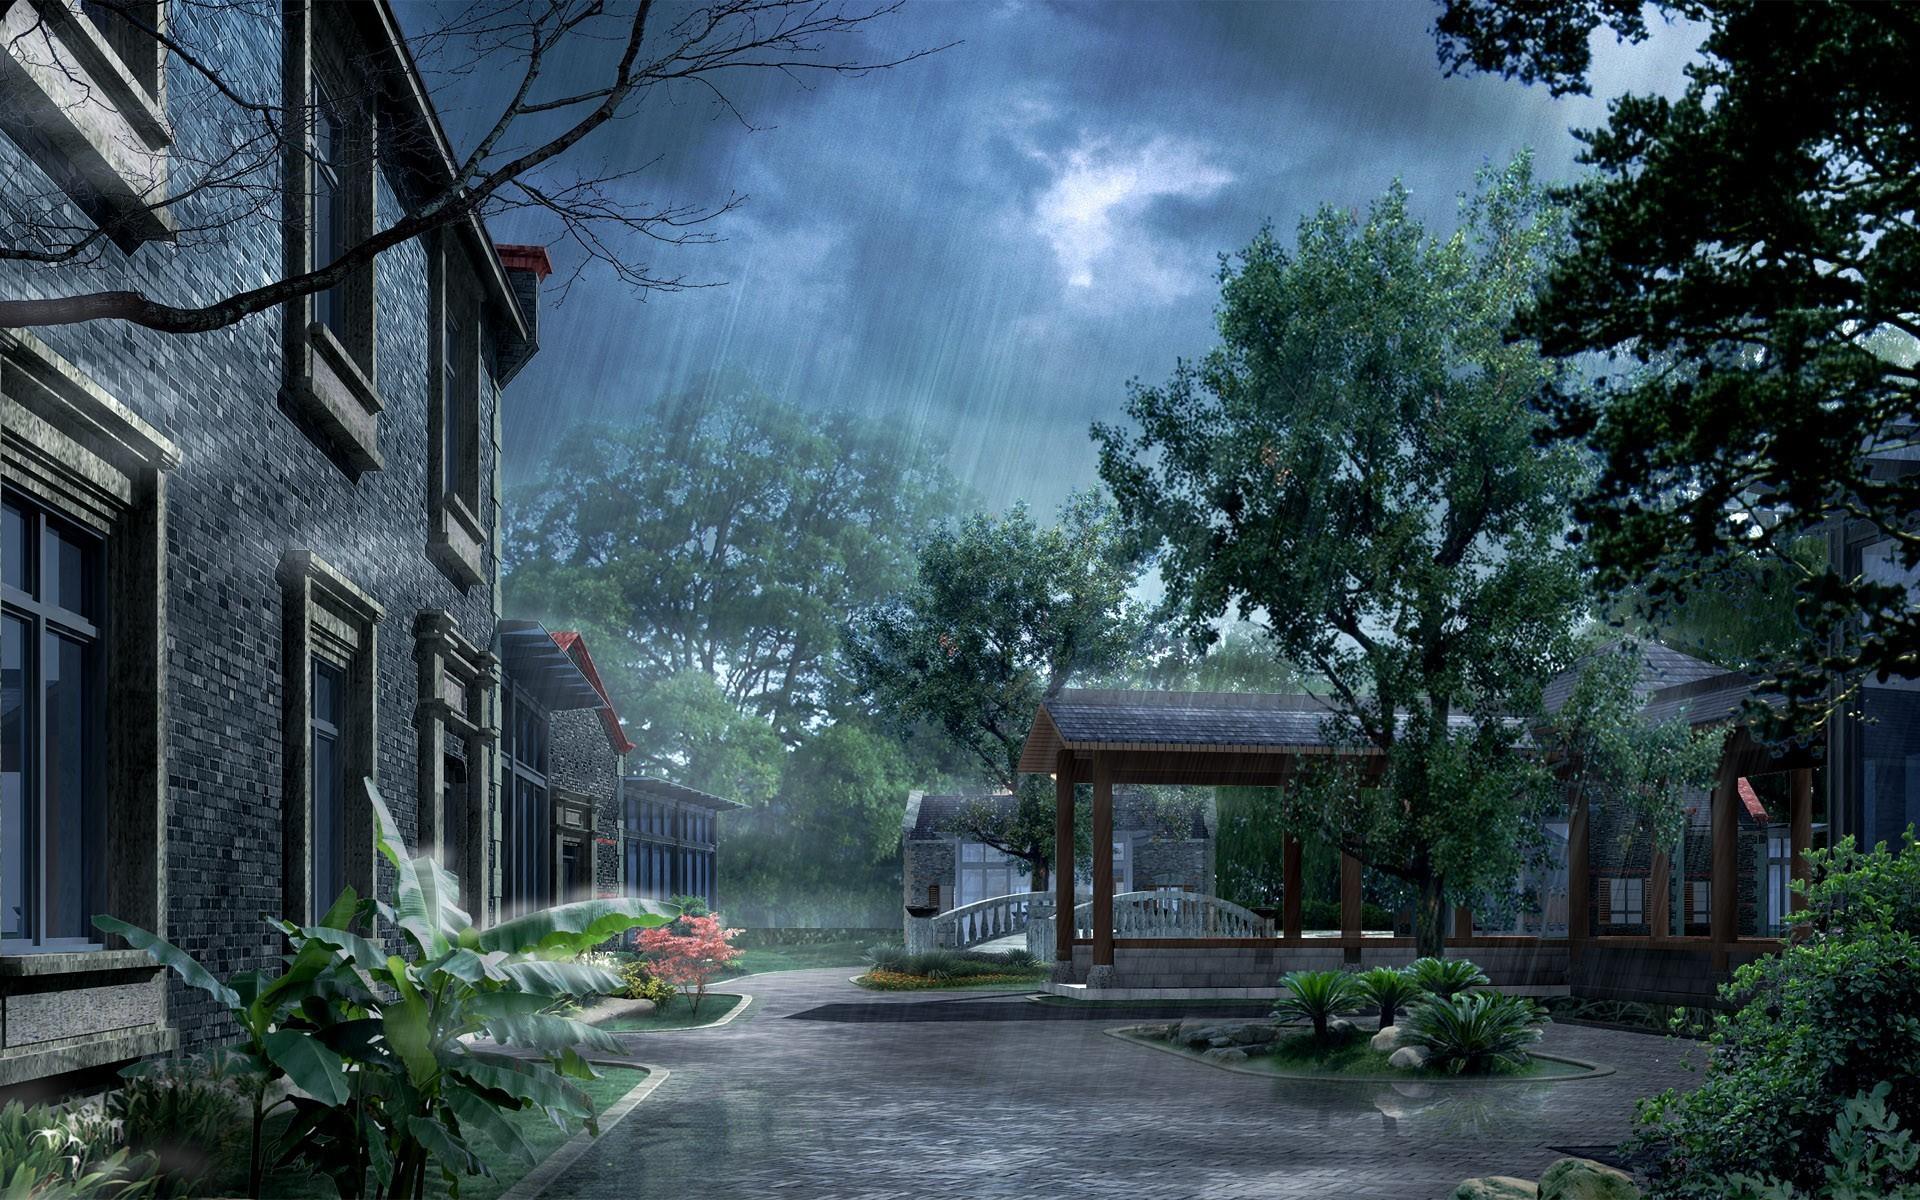 2560x1920 Beautiful Rain HD Wallpapers For Desktop